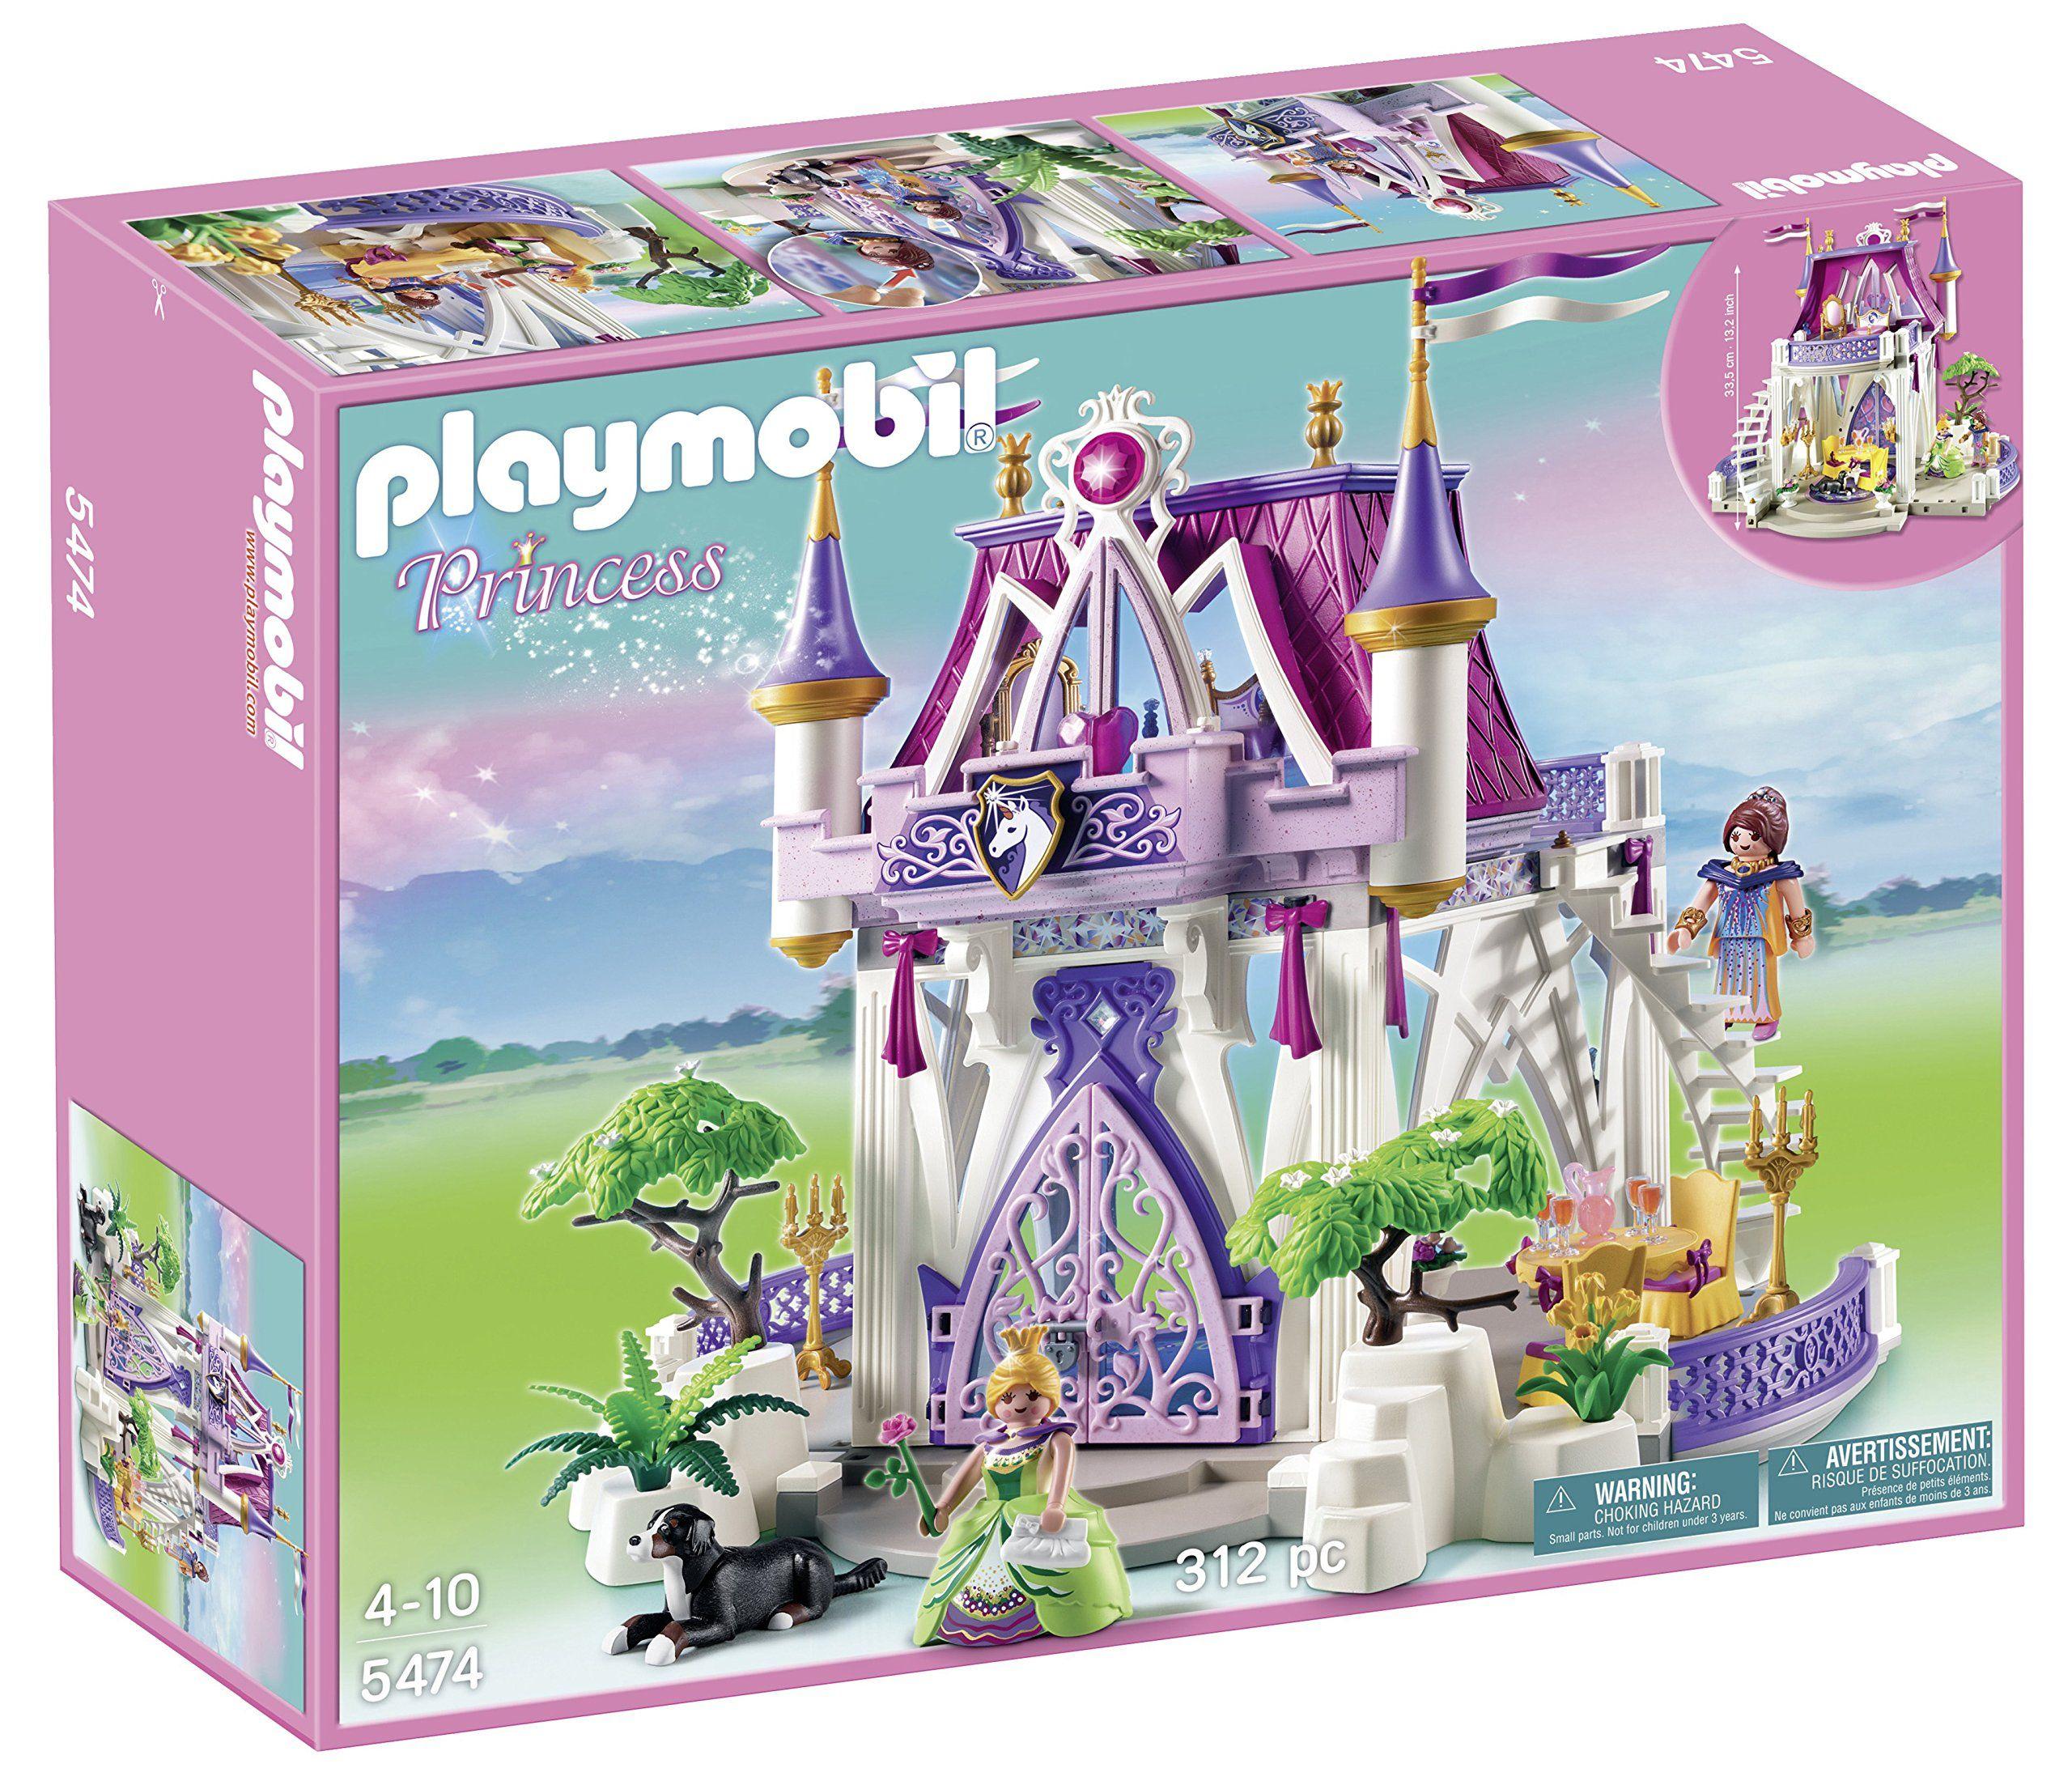 PLAYMOBIL Unicorn Jewel Castle Playset. Take a fantastical